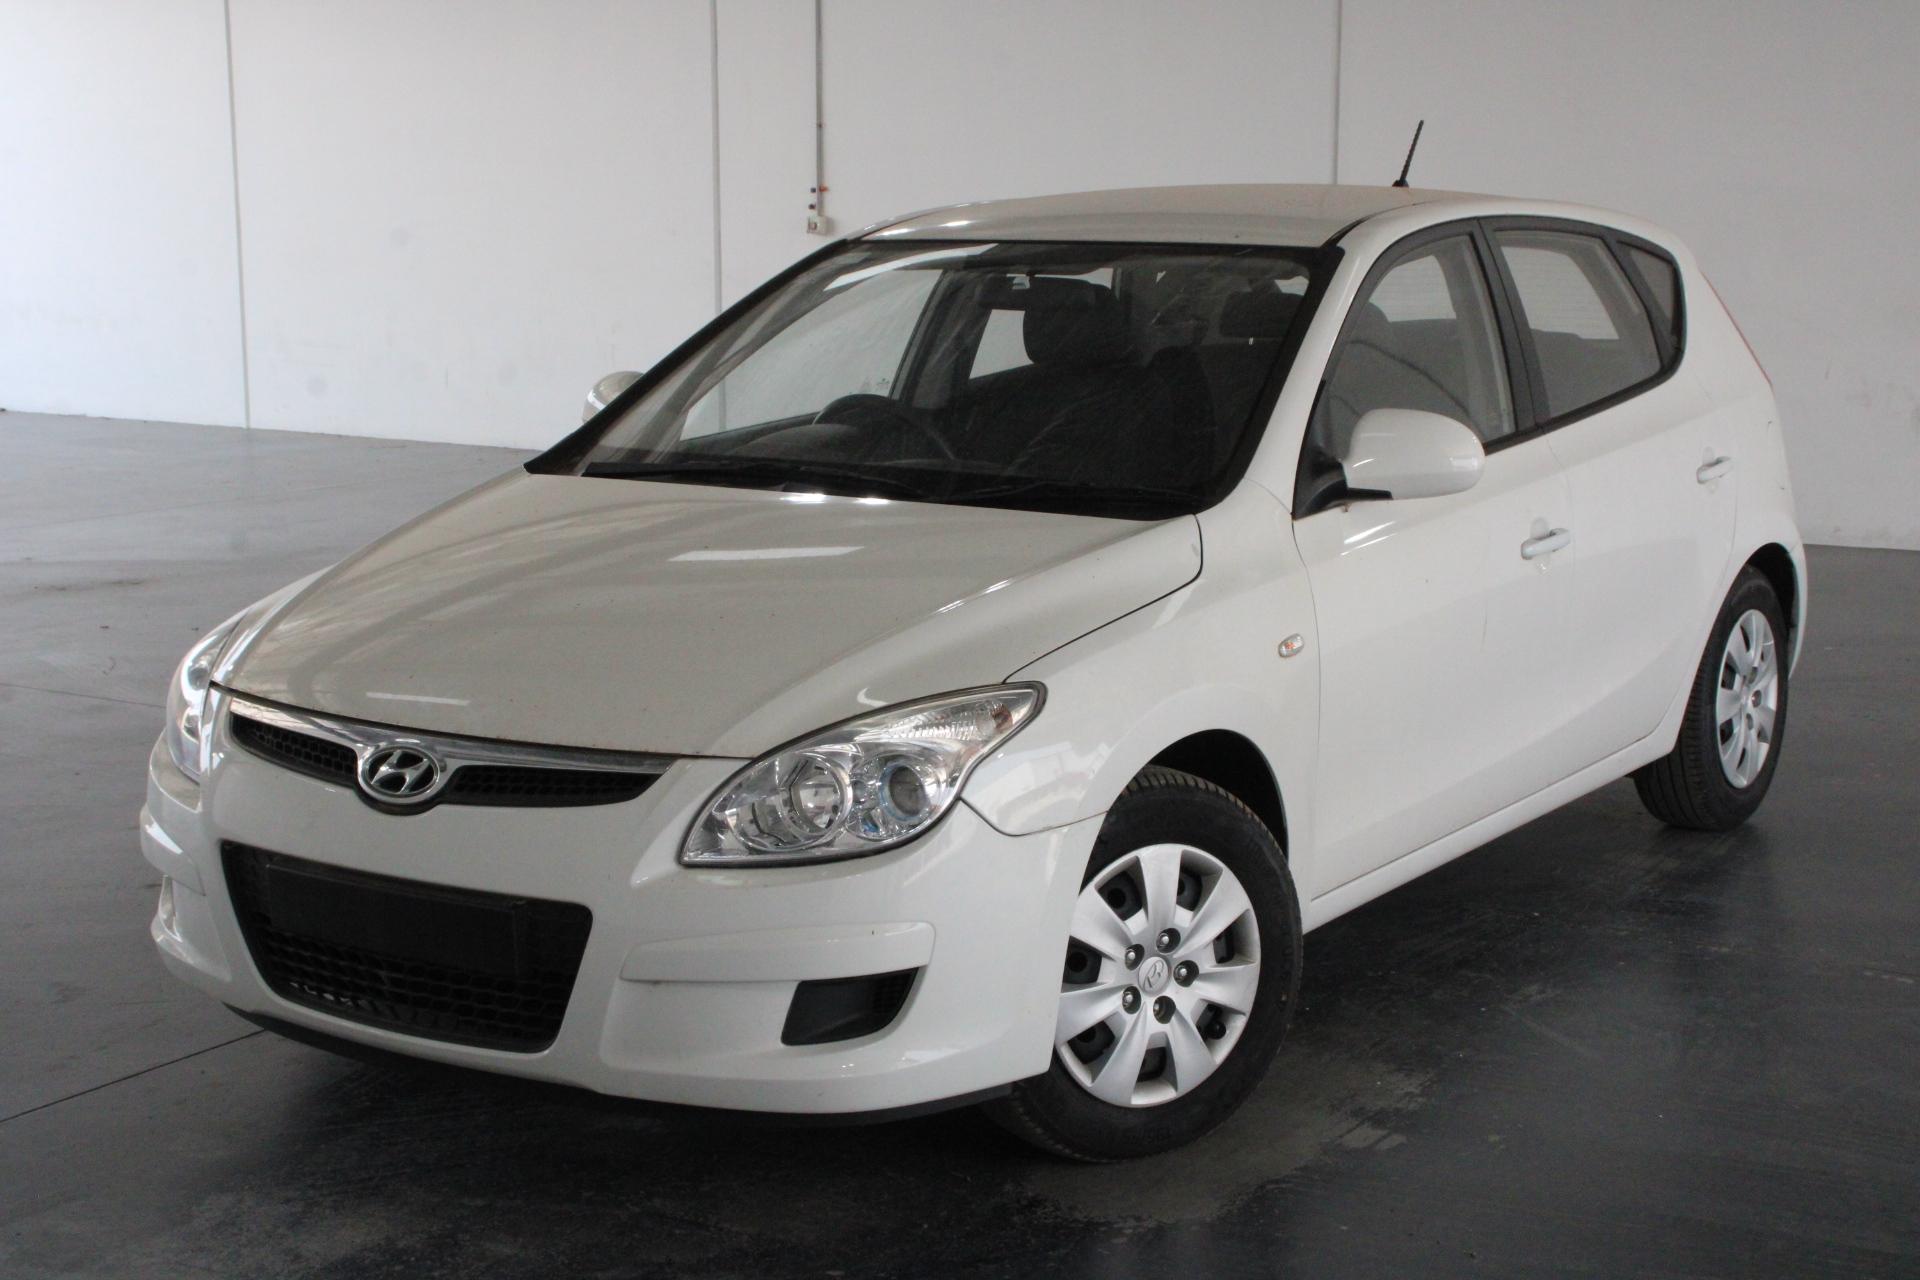 2009 Hyundai i30 SX FD Automatic Hatchback (WOVR)